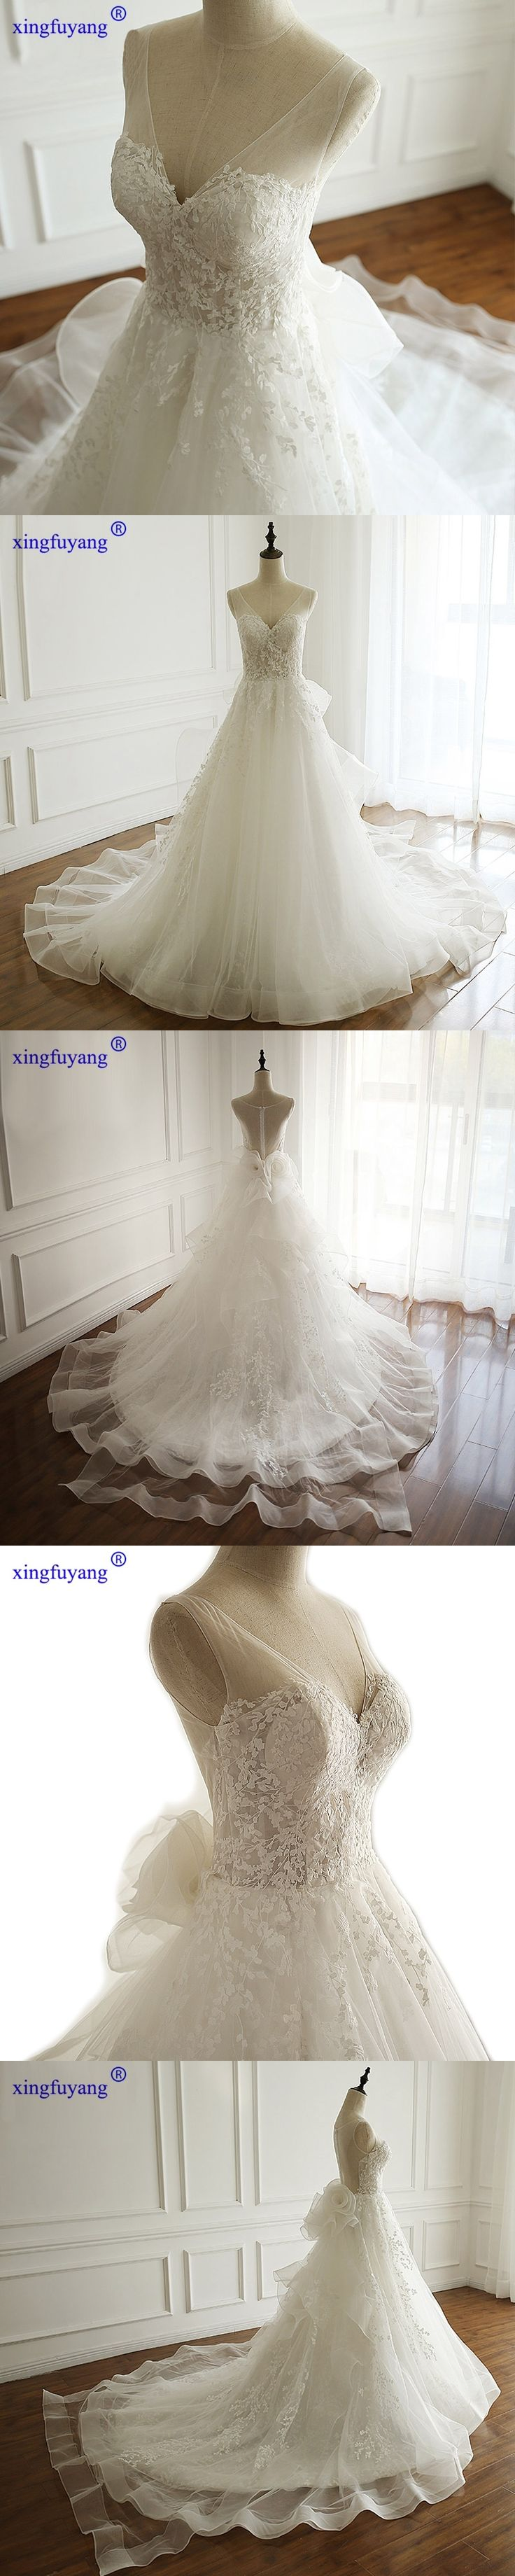 V Neck Detachable Wedding Dress Skirt Strap Ivory White Vintage Wedding Dress Lace Flower Wedding Dresses With Detachable Train